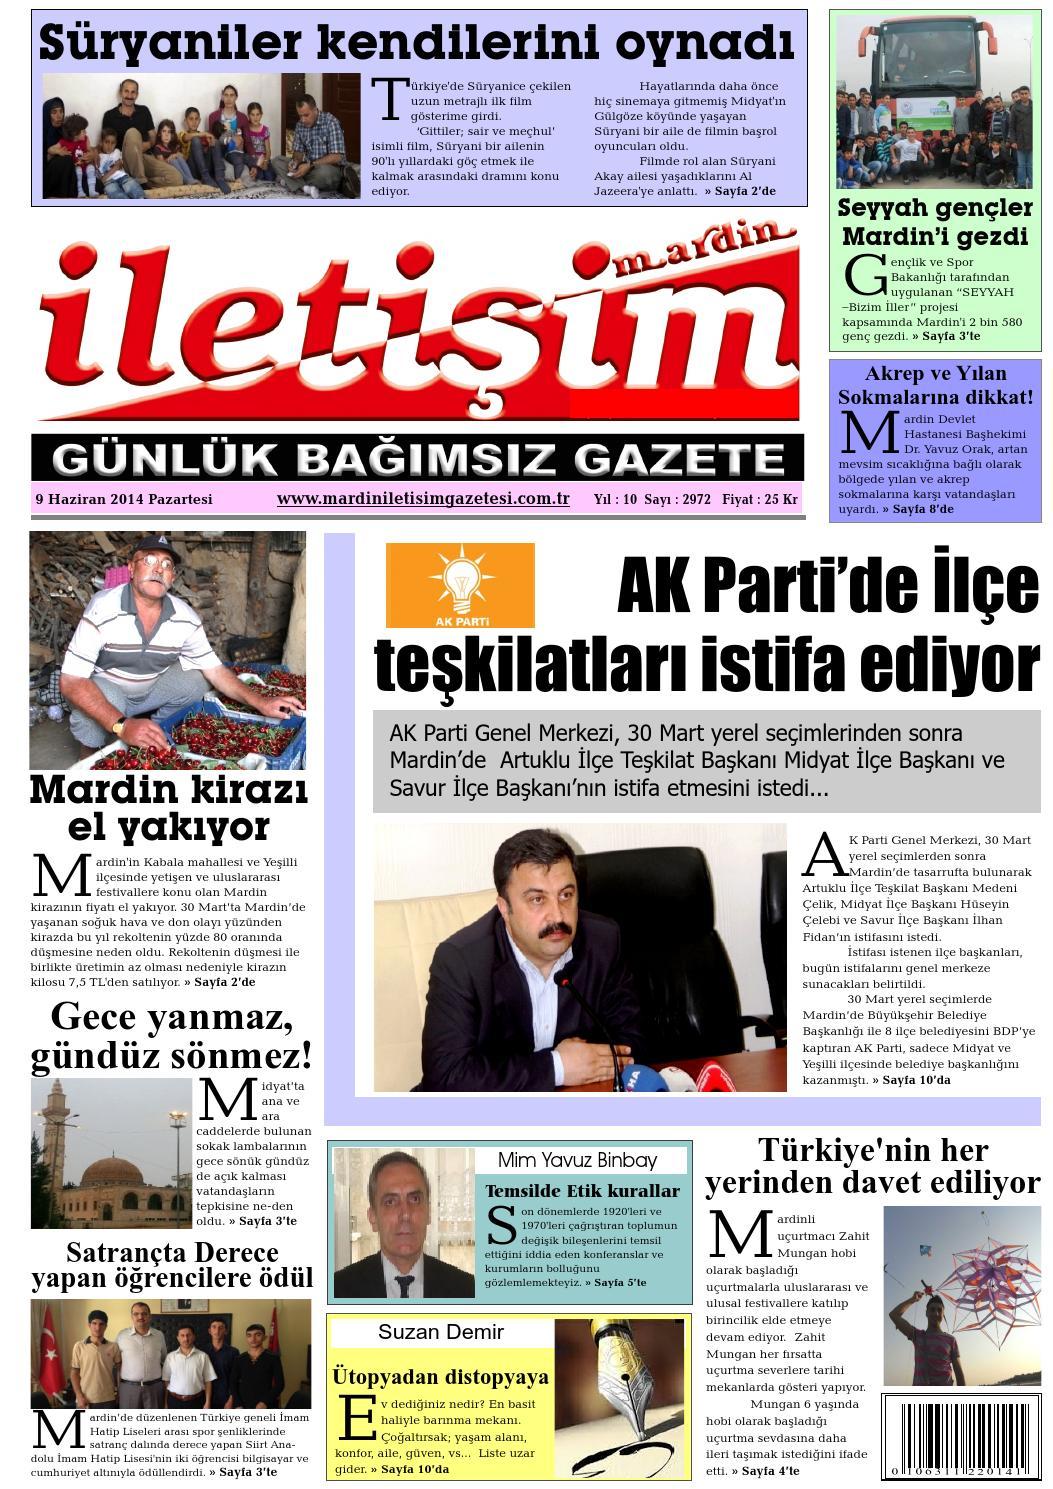 9 Haziran 2014 Pazartesi By Mardin Iletisim Gazetesi Issuu